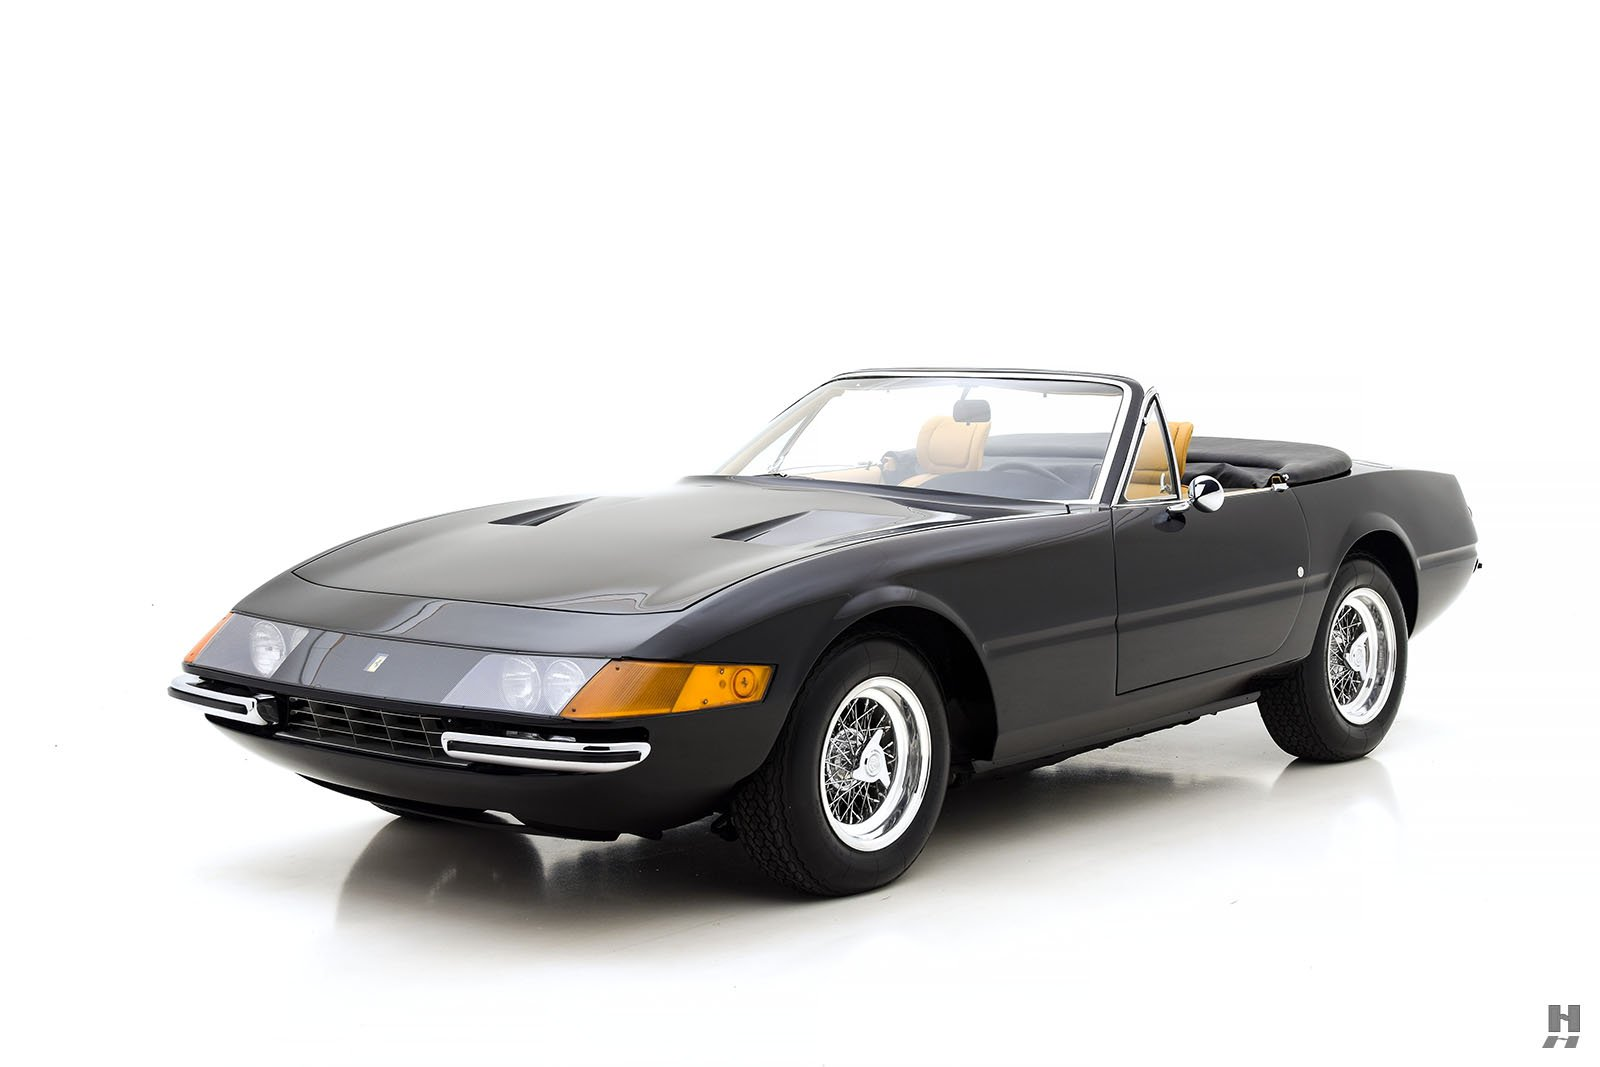 1971 Ferrari 365 Gtb 4 Daytona Spyder For Sale Buy Cars Hyman Ltd